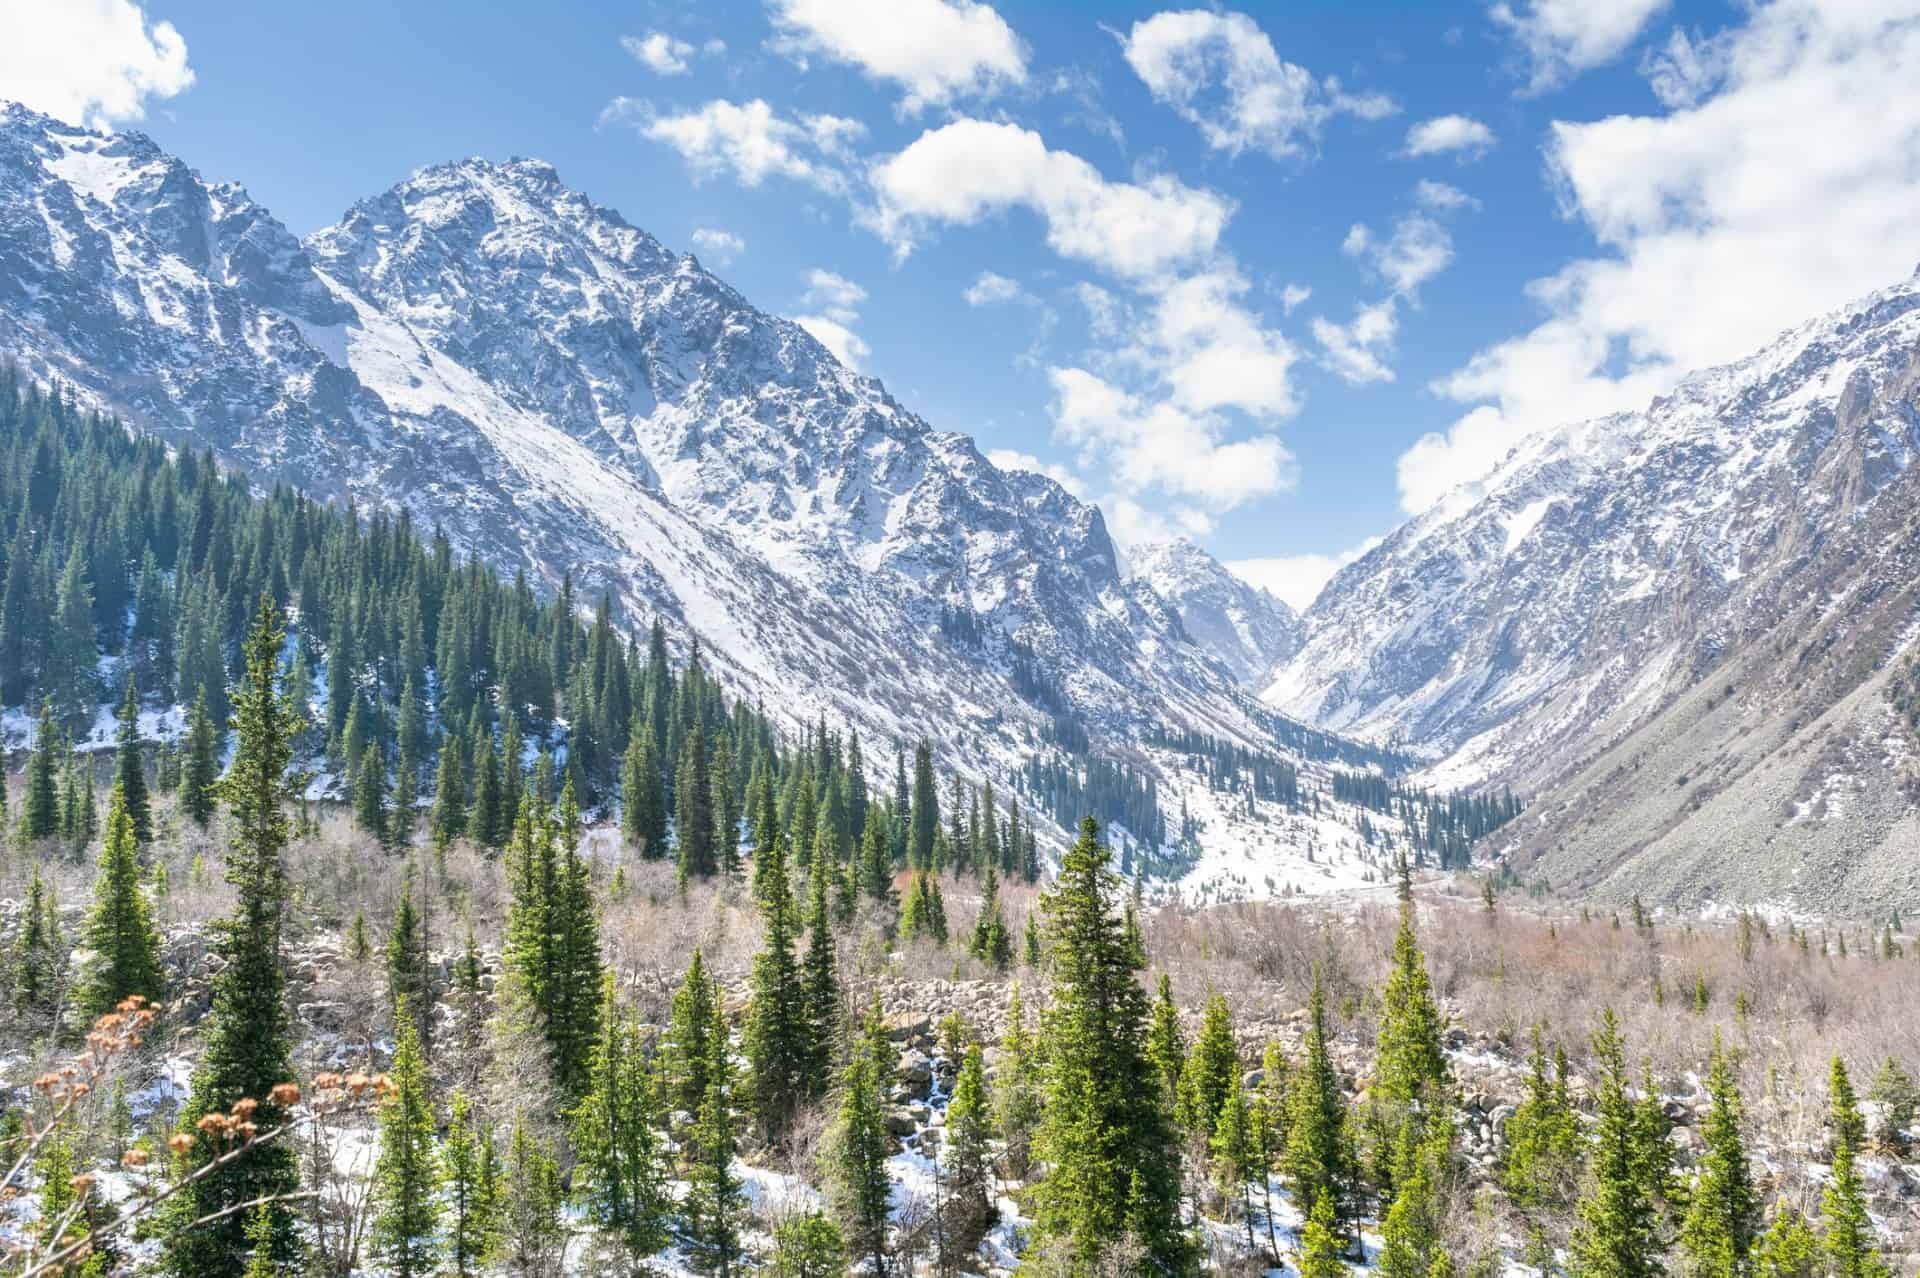 Ala-Archa National Park in Kyrgyzstan